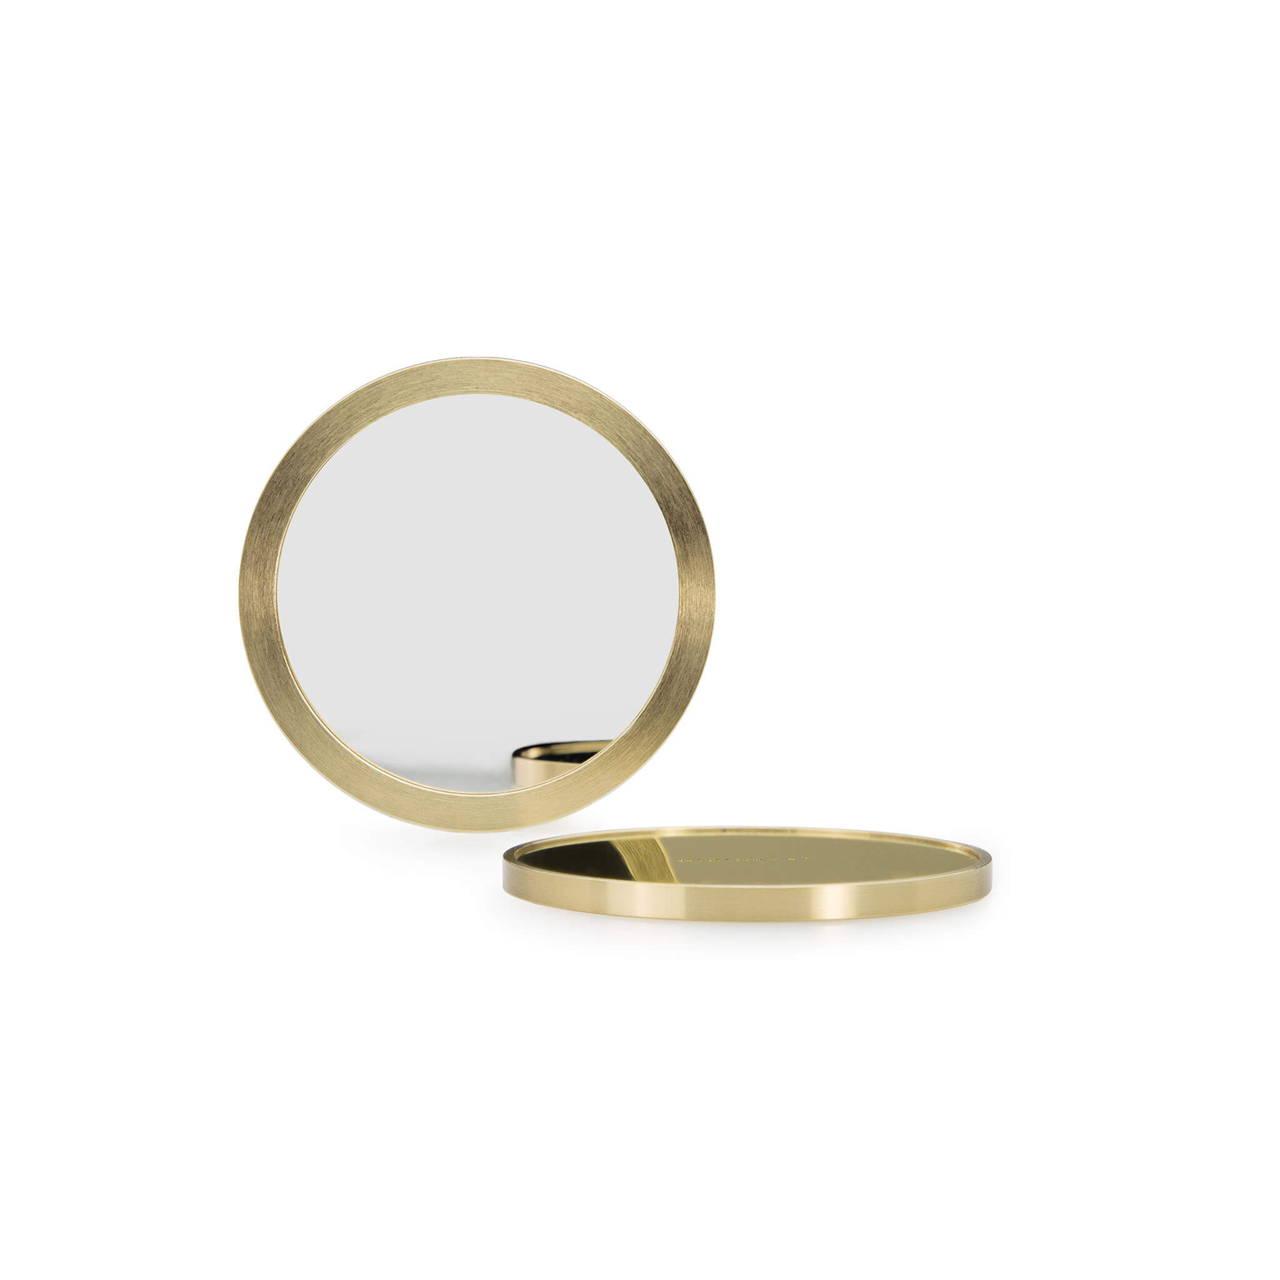 Brass Pocket Mirrors